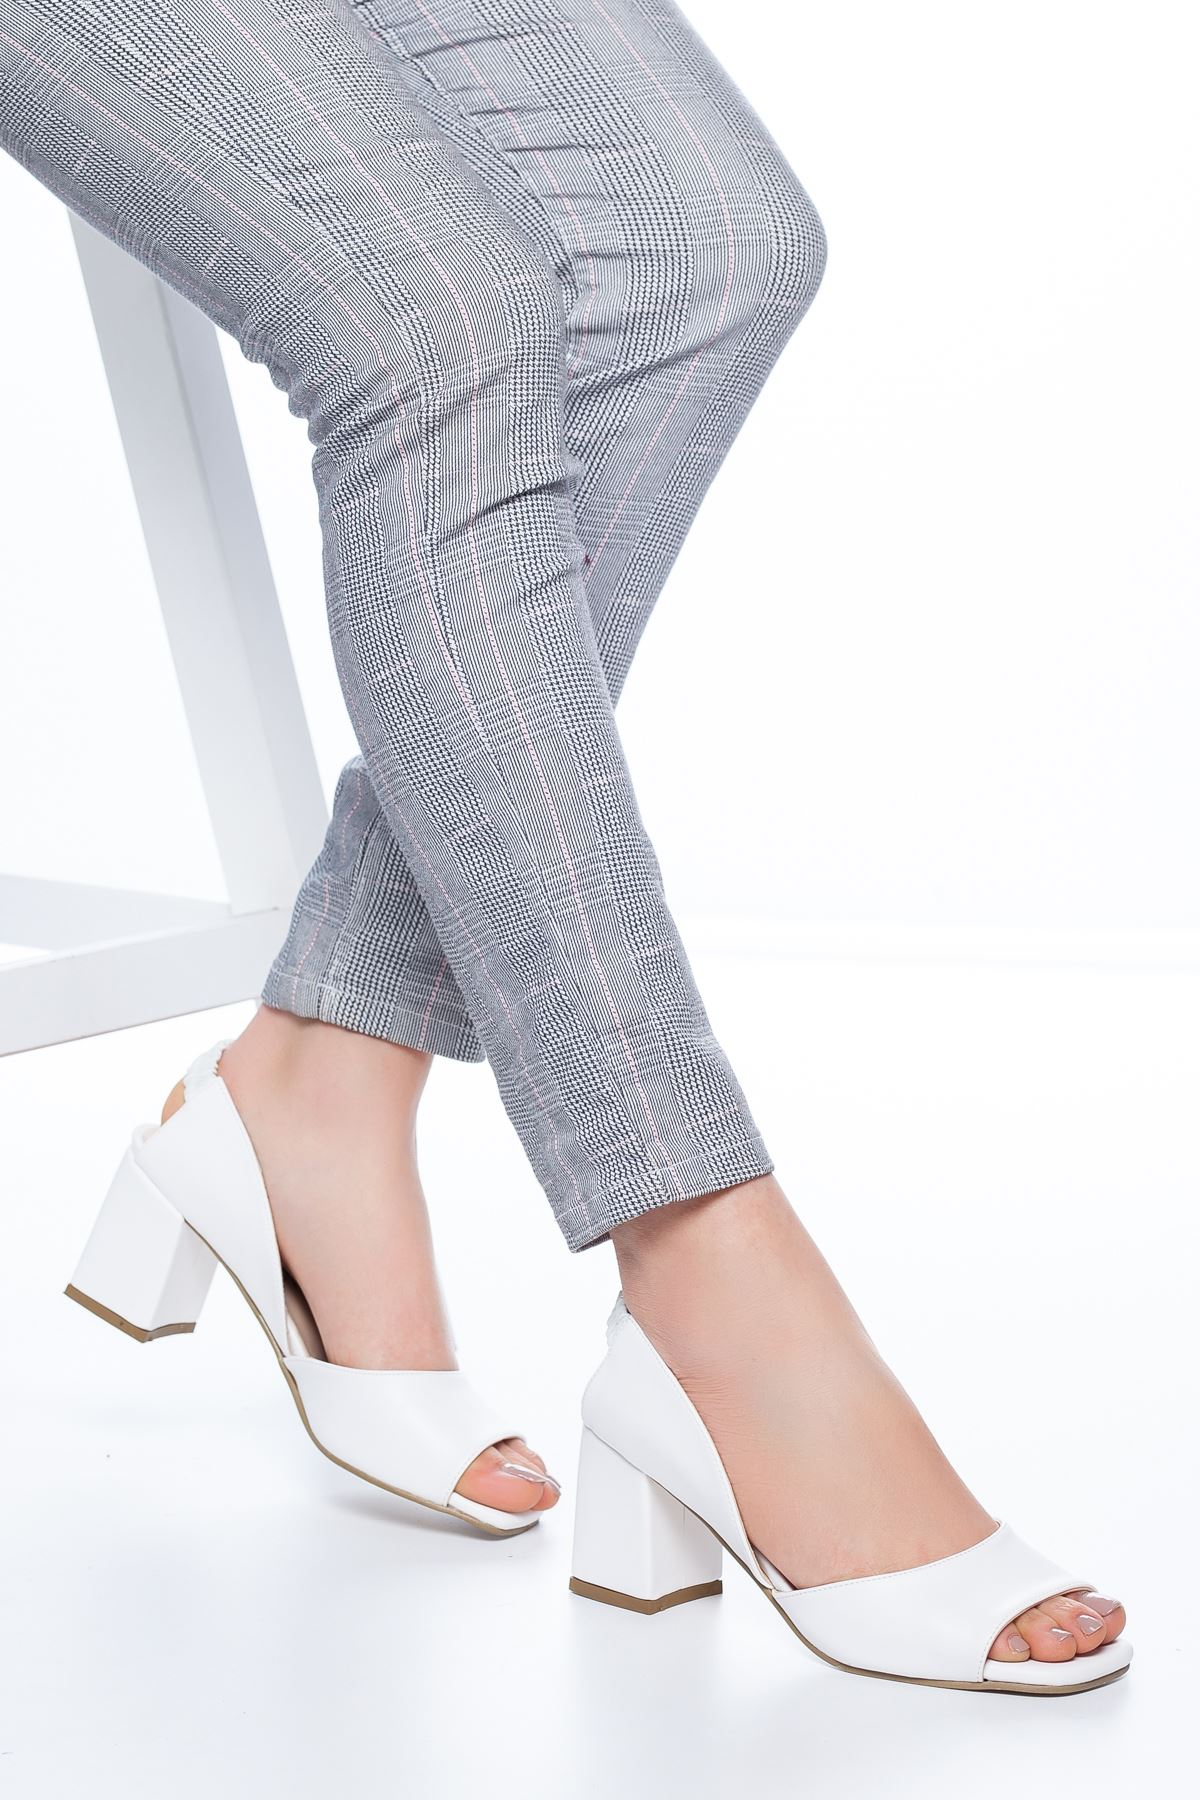 Lessia Topuklu Cilt Ayakkabı Beyaz